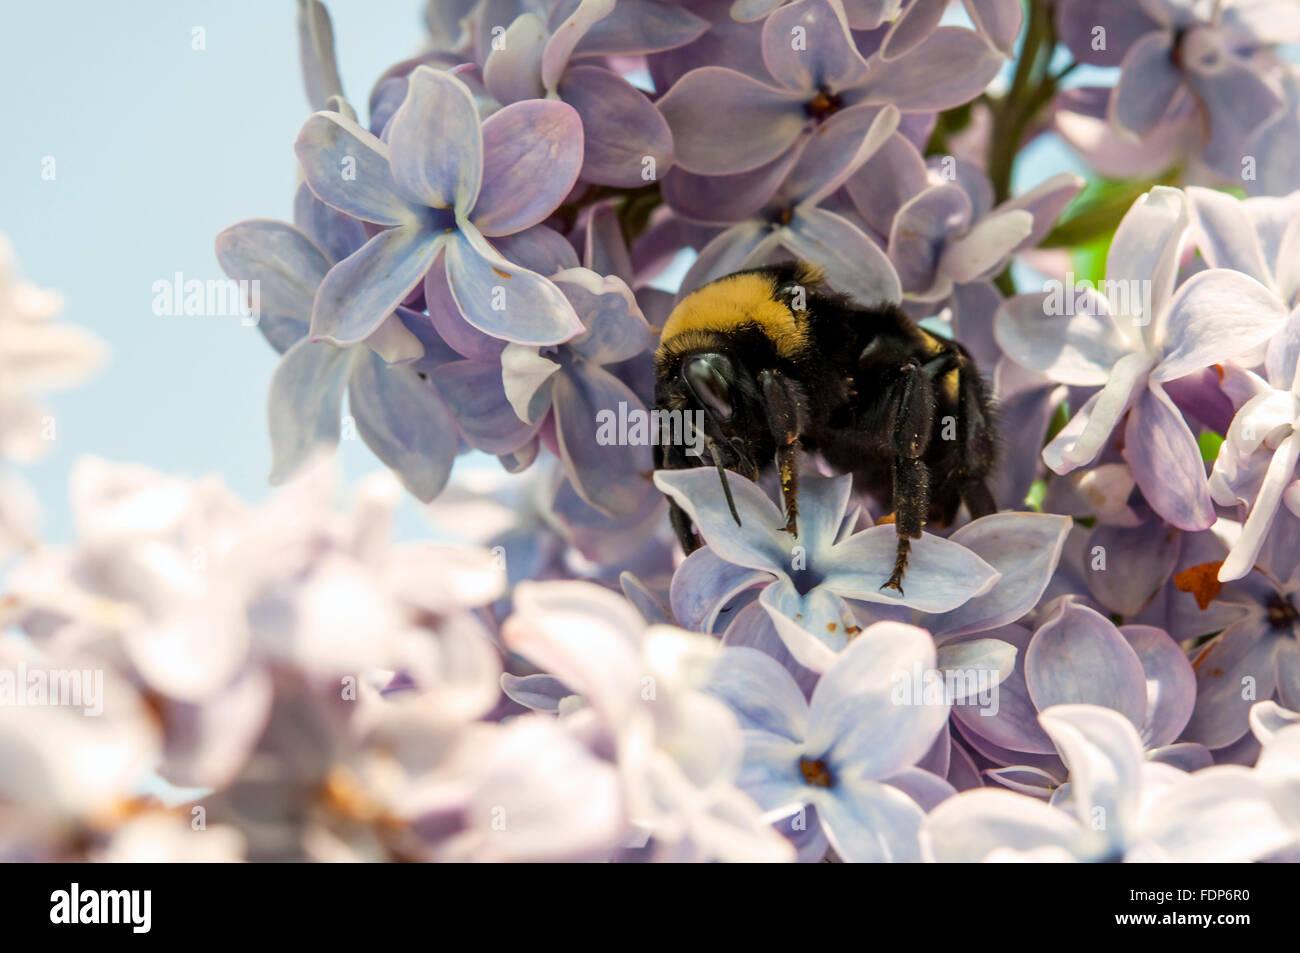 Polinización abejorros flores lila Imagen De Stock